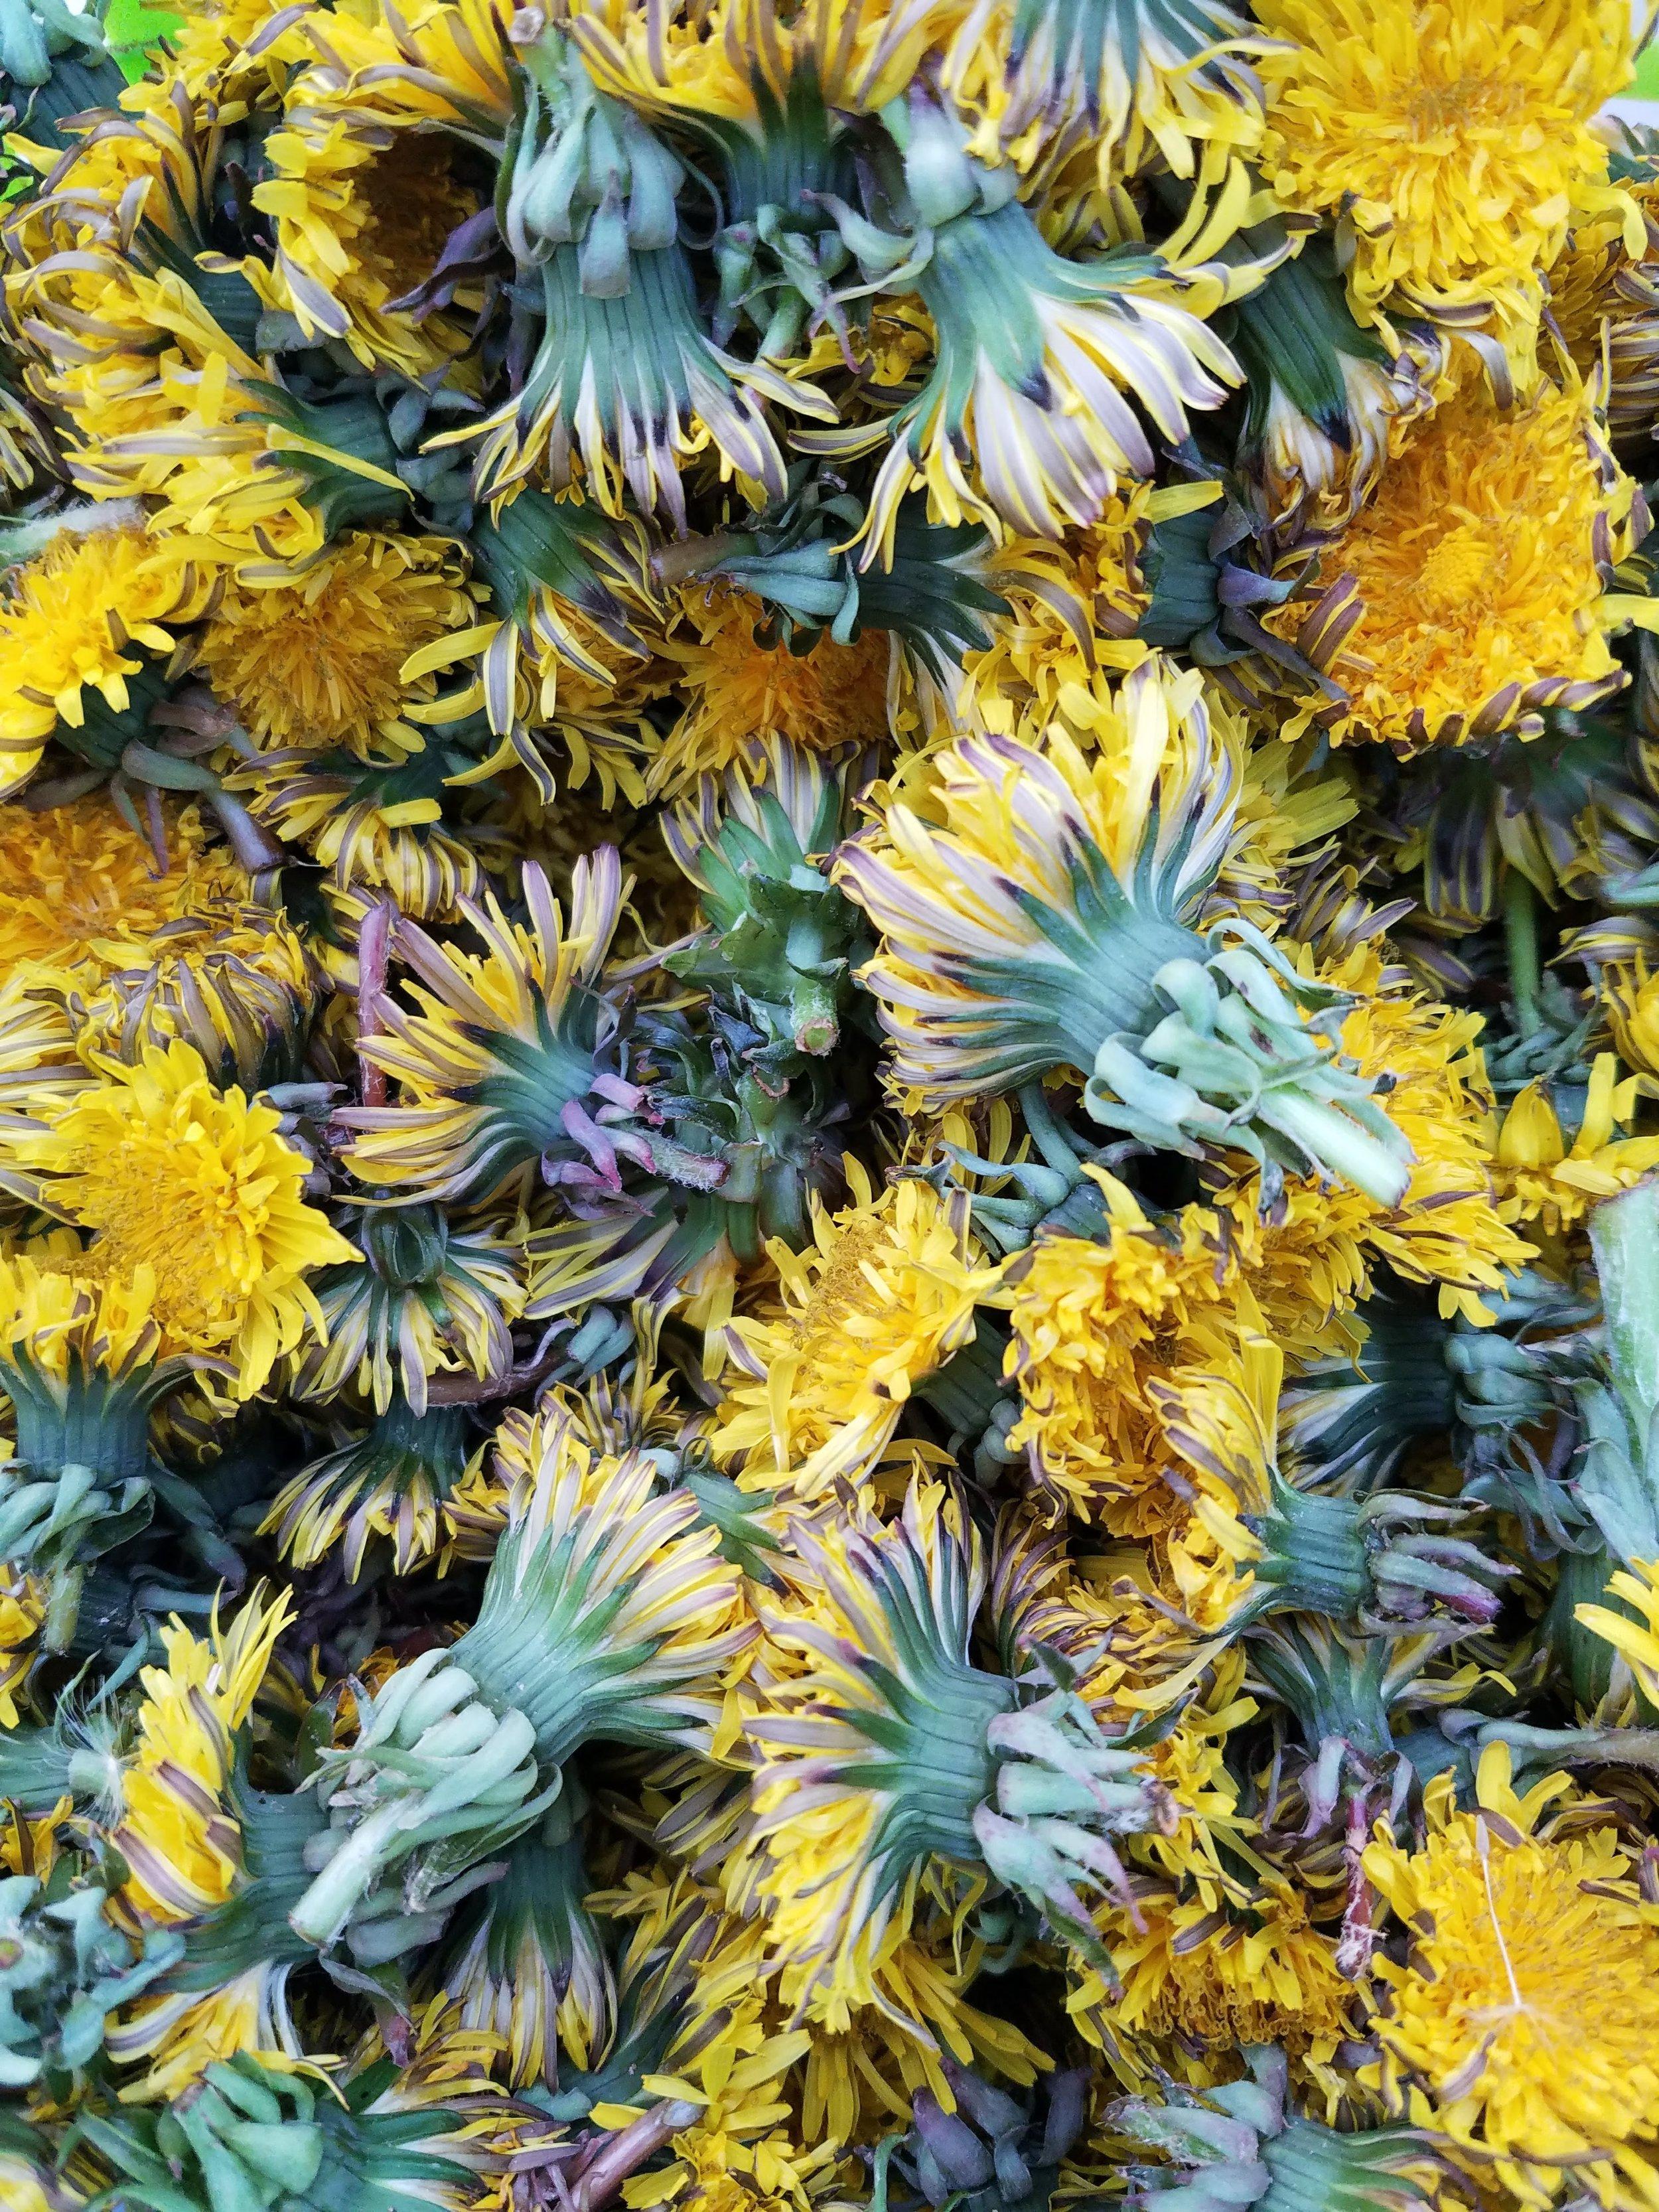 Another spring crop - dandelions!